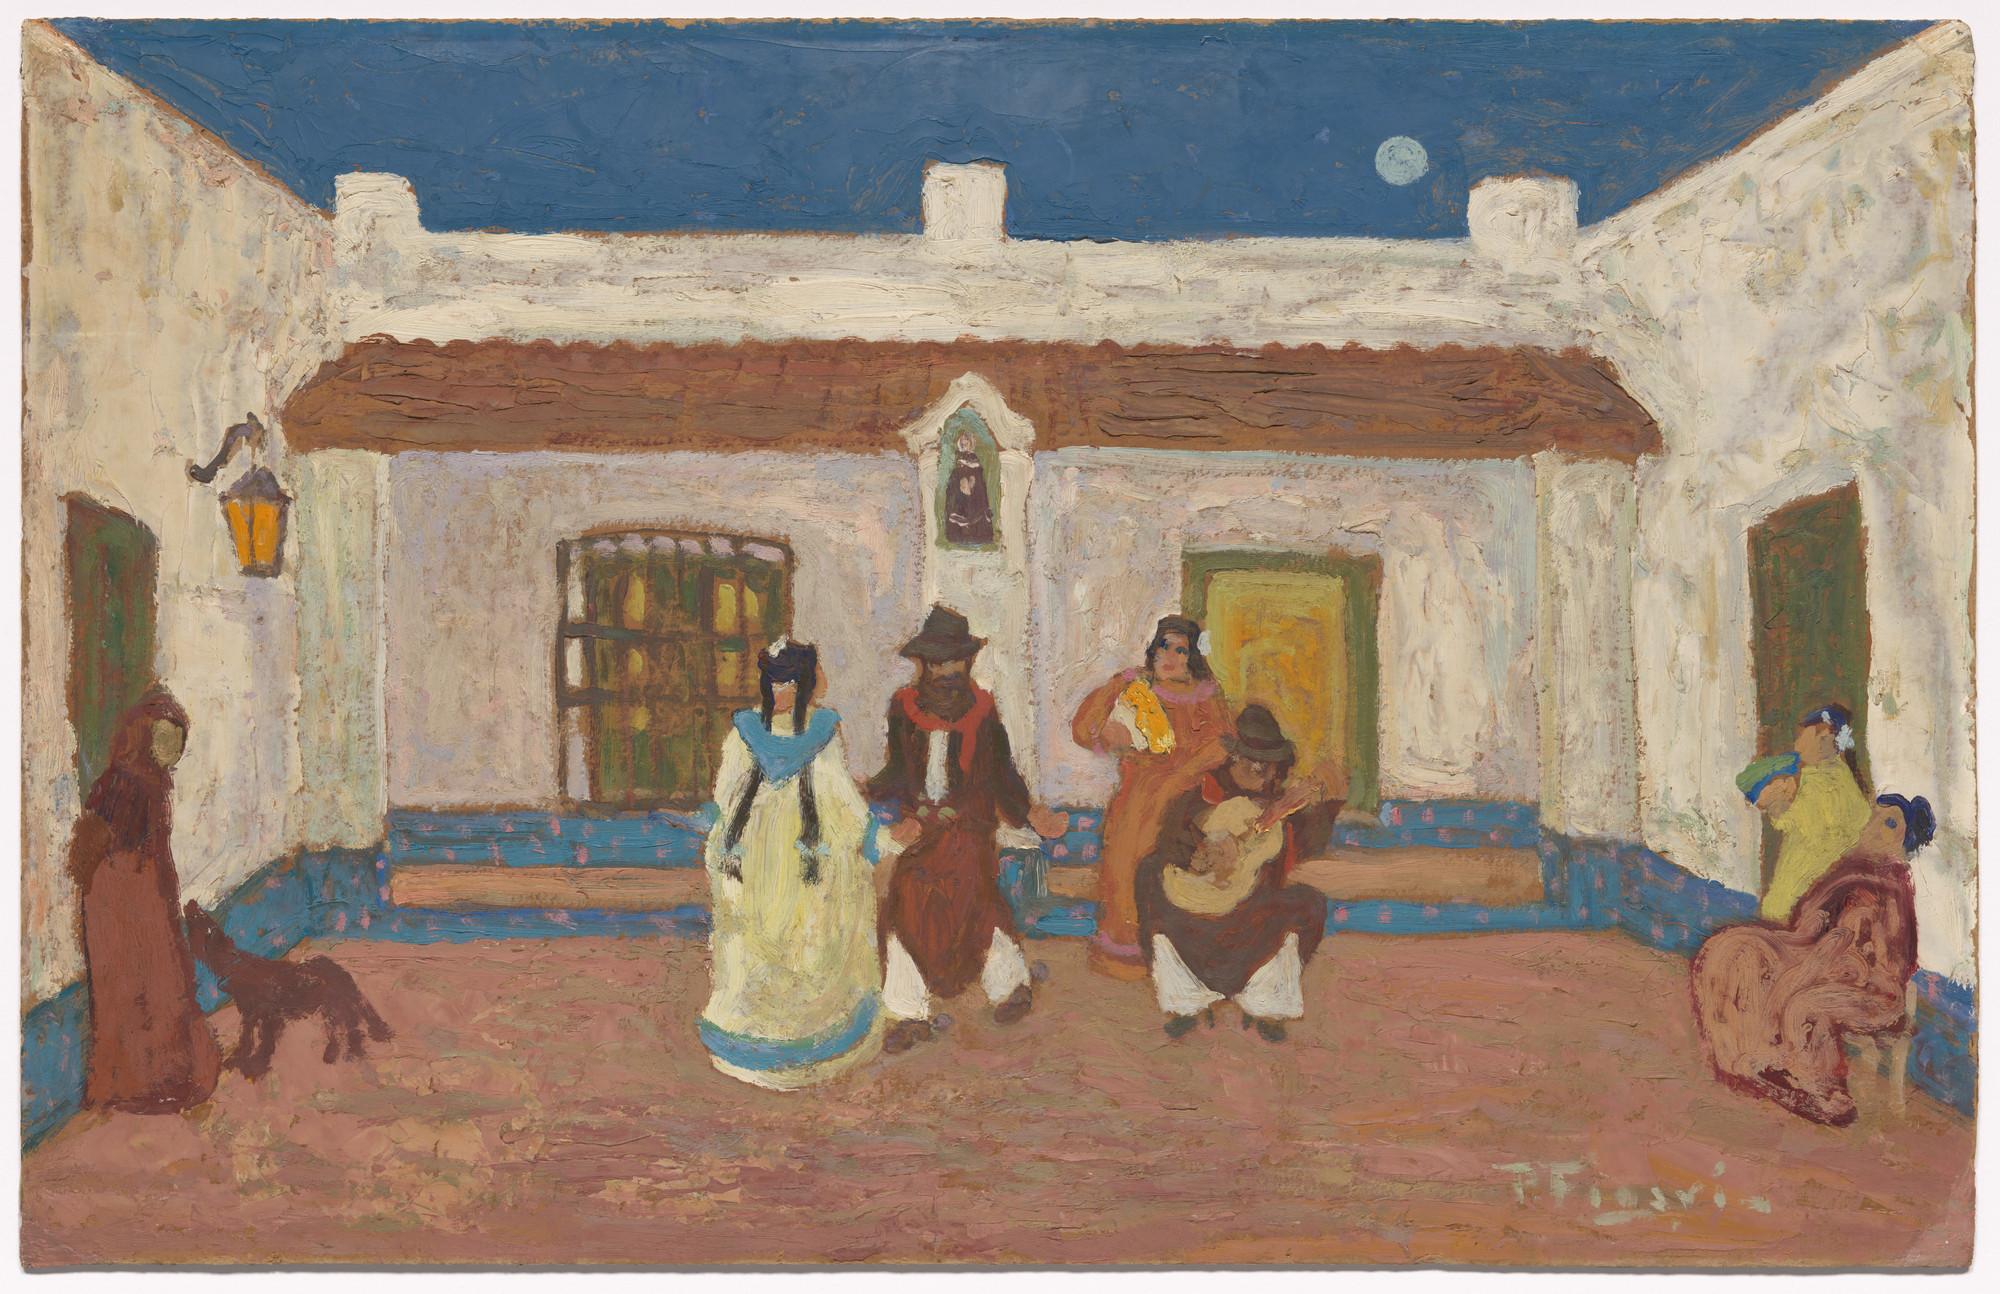 Pedro Figari. Creole Dance. c. 1925 | MoMA